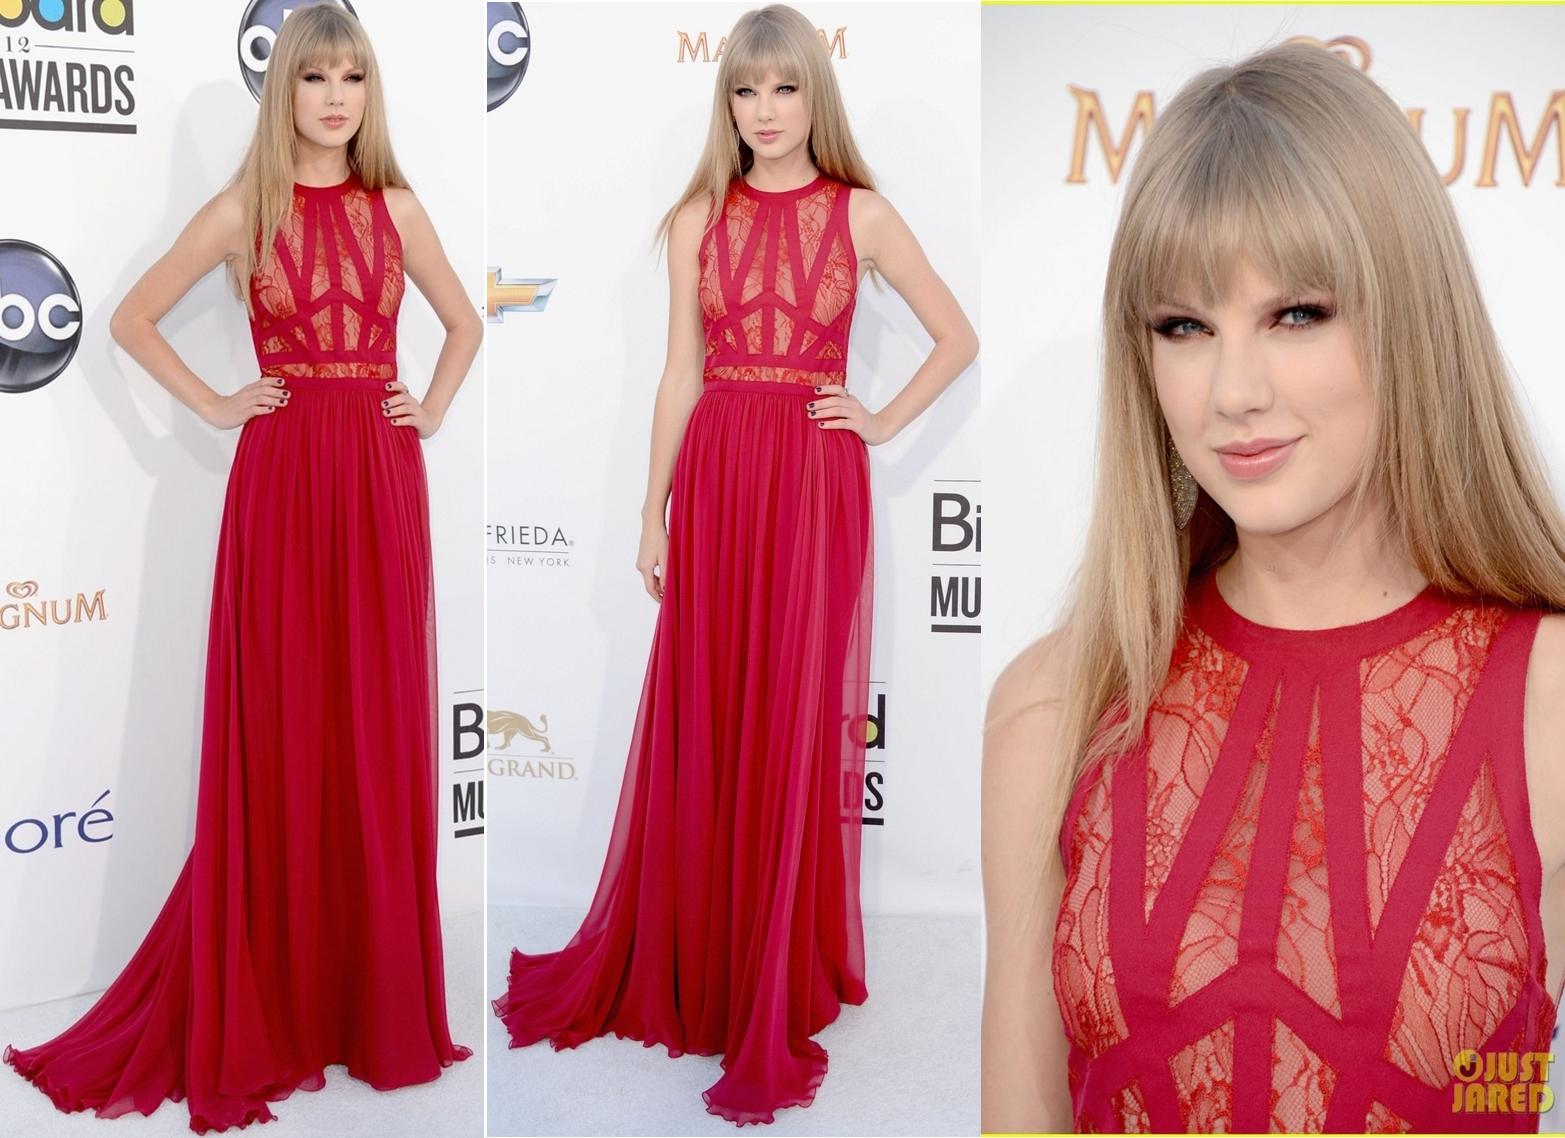 http://1.bp.blogspot.com/-h-KuWU1p9s0/T7oMjUbG50I/AAAAAAAAI2A/9CStRw_OfuI/s1600/taylor-swift-billboard-awards-2012-01.jpg